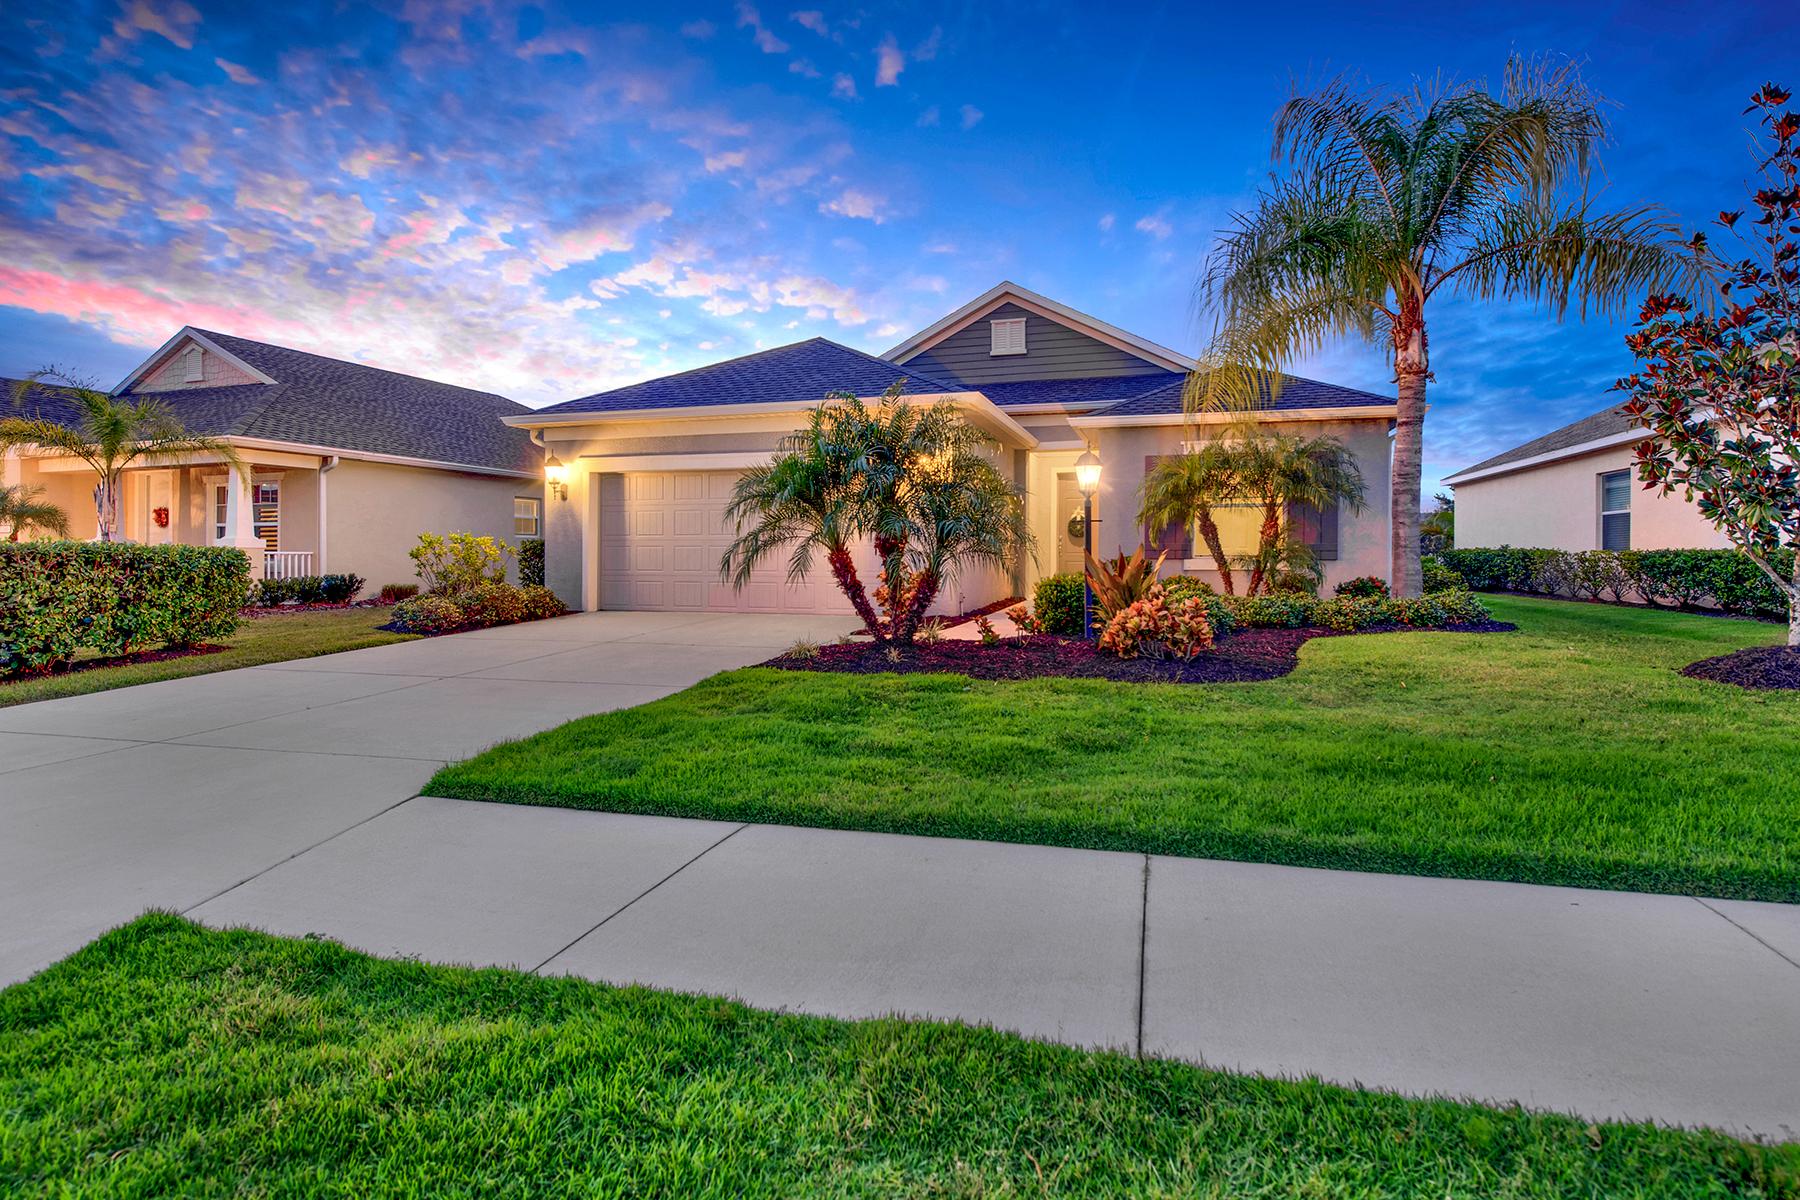 Single Family Homes のために 売買 アット CENTRAL PARK 12147 Longview Lake Cir Bradenton, フロリダ 34211 アメリカ